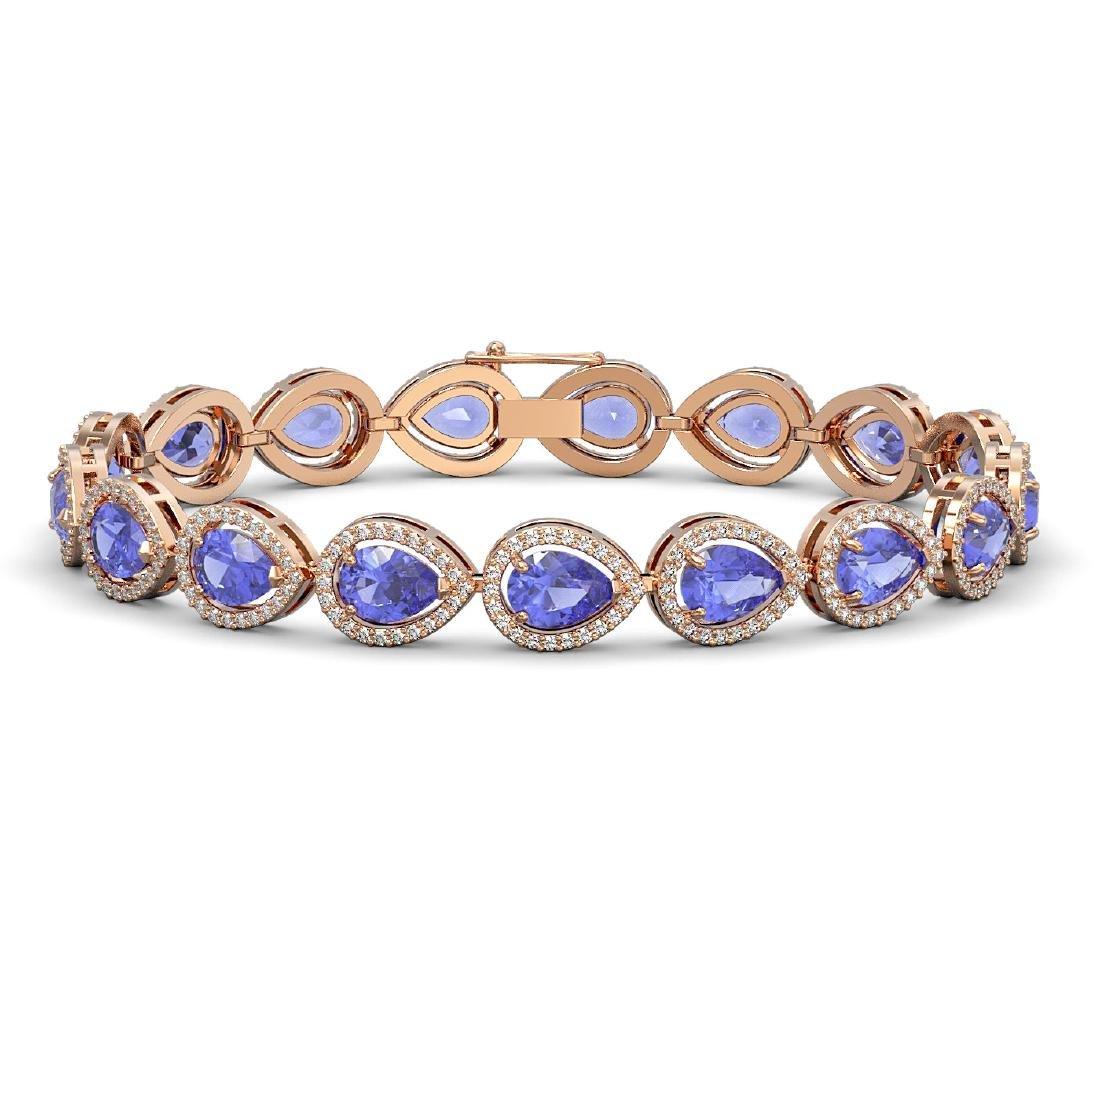 19.14 CTW Tanzanite & Diamond Halo Bracelet 10K Rose